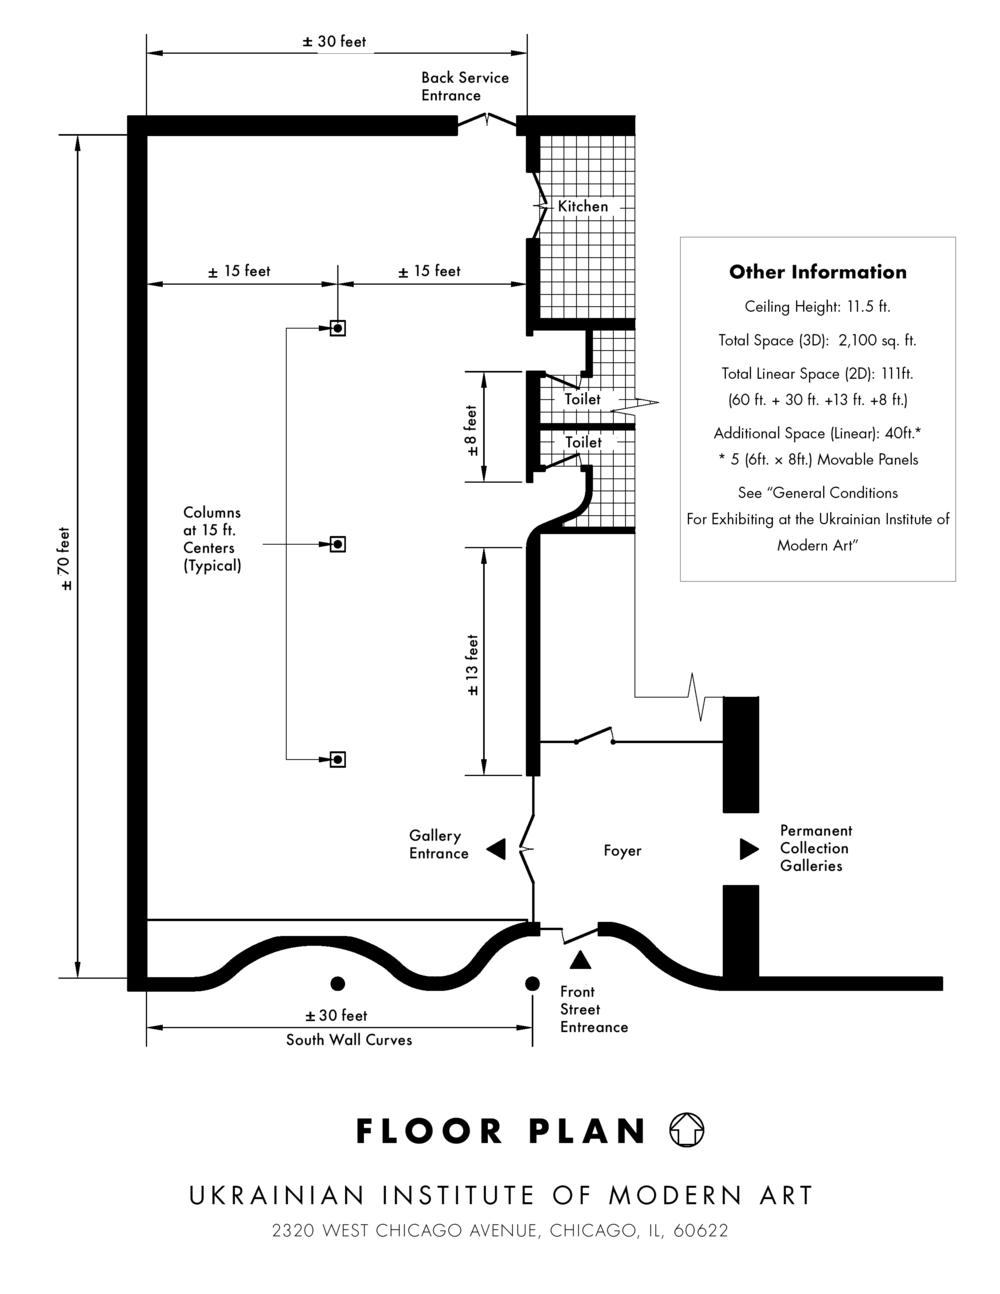 UIMA_floor_plan_futura.png